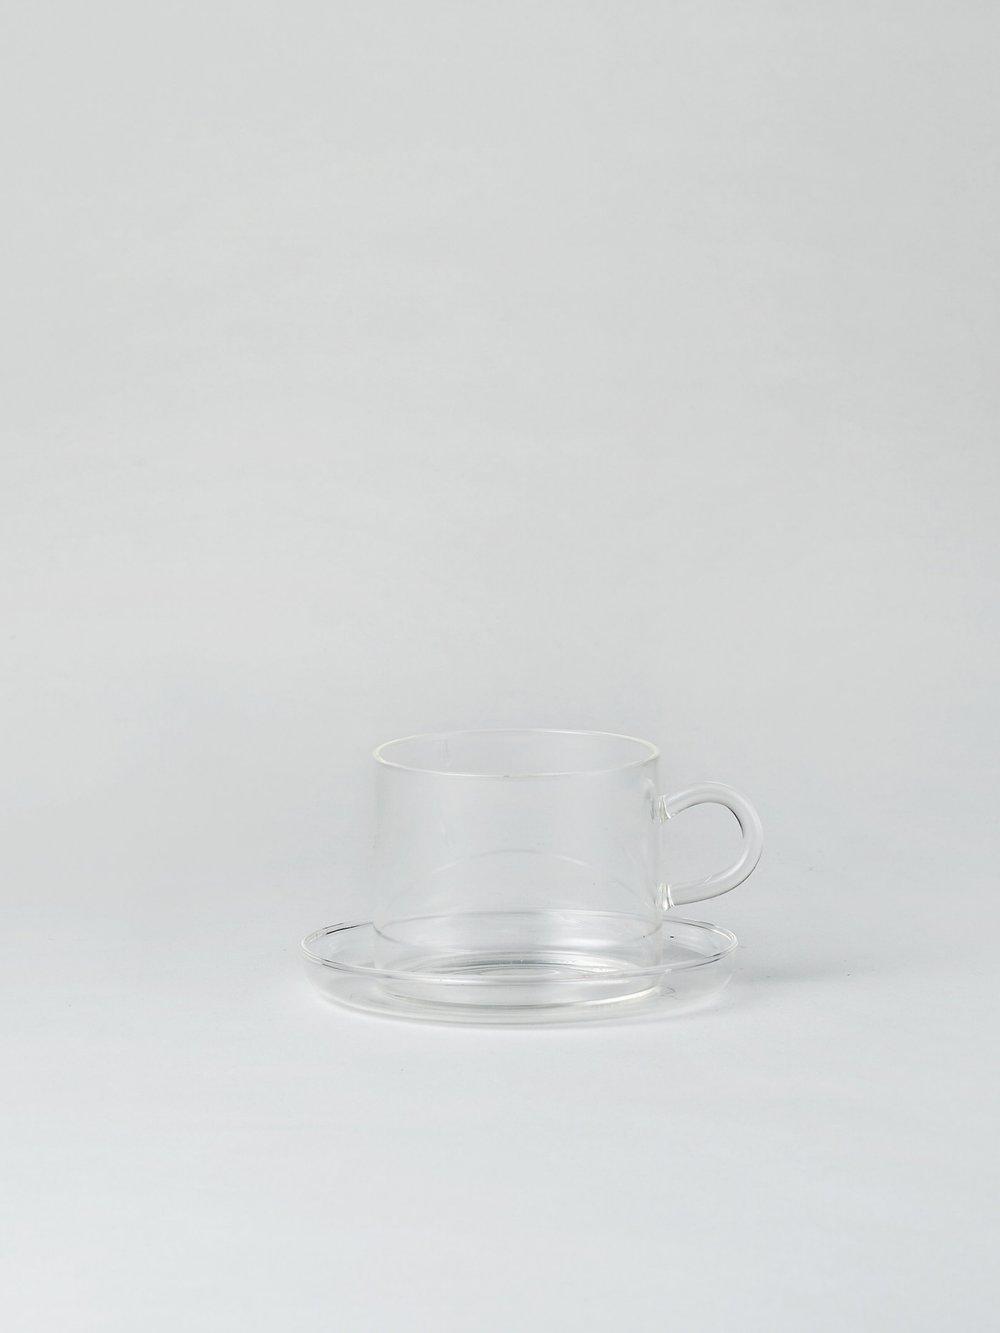 Piuma Tea Cup + Saucer $29.90